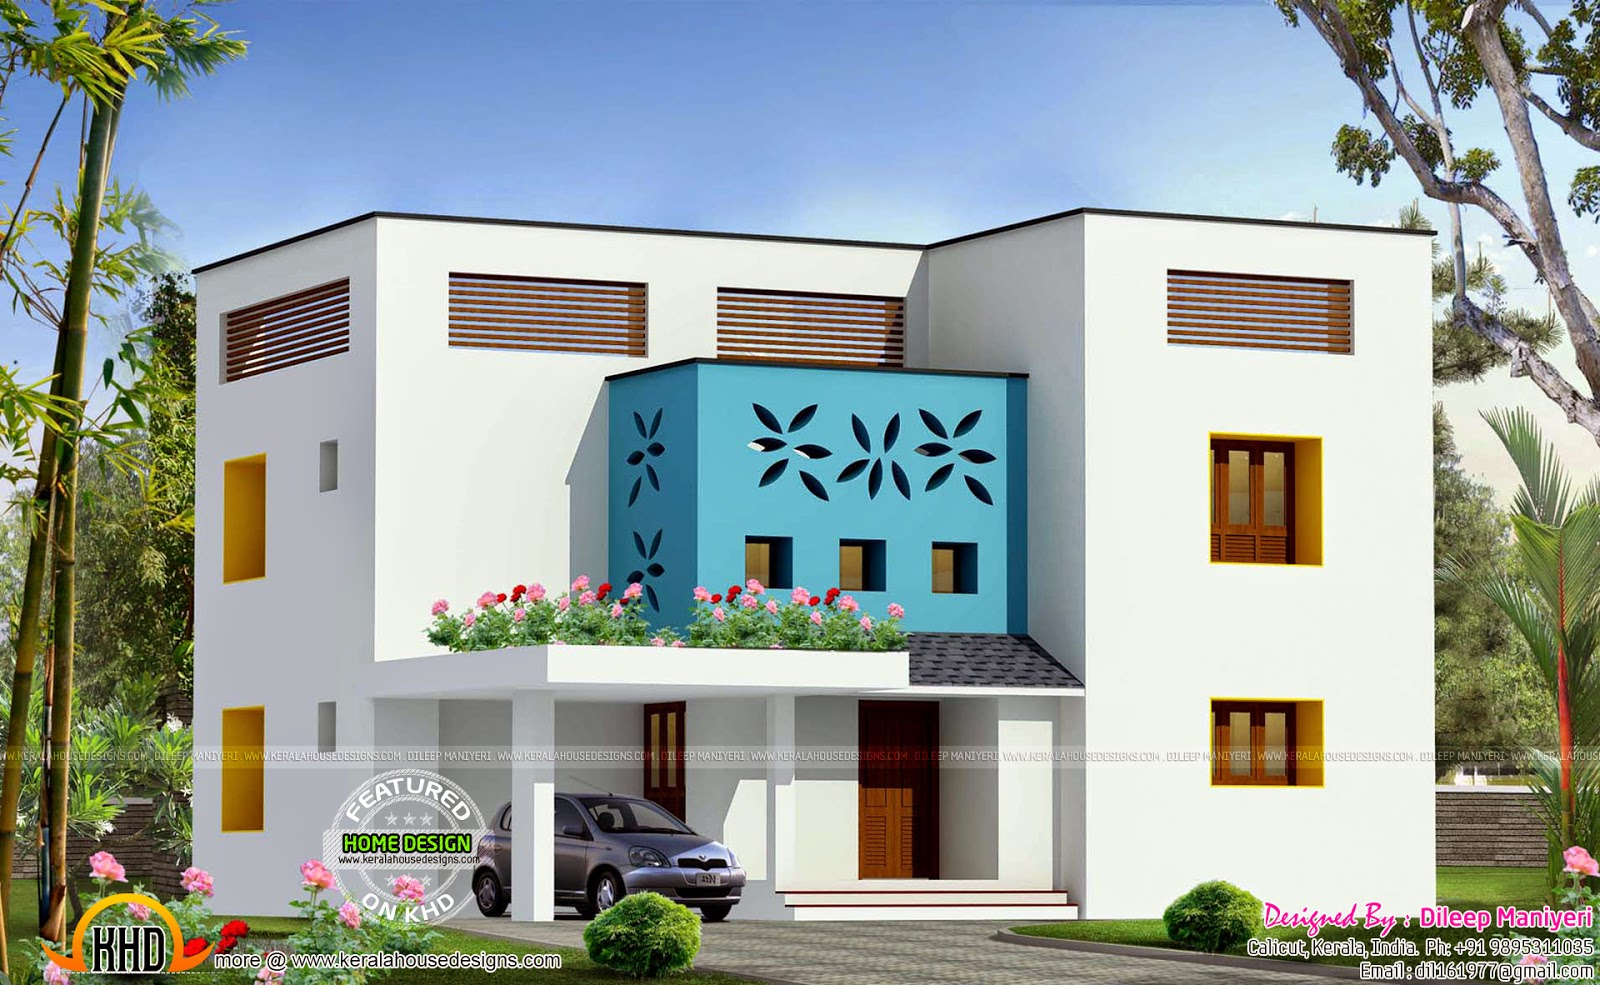 223 Sq M Contemporary Villa Exterior Keralahousedesigns